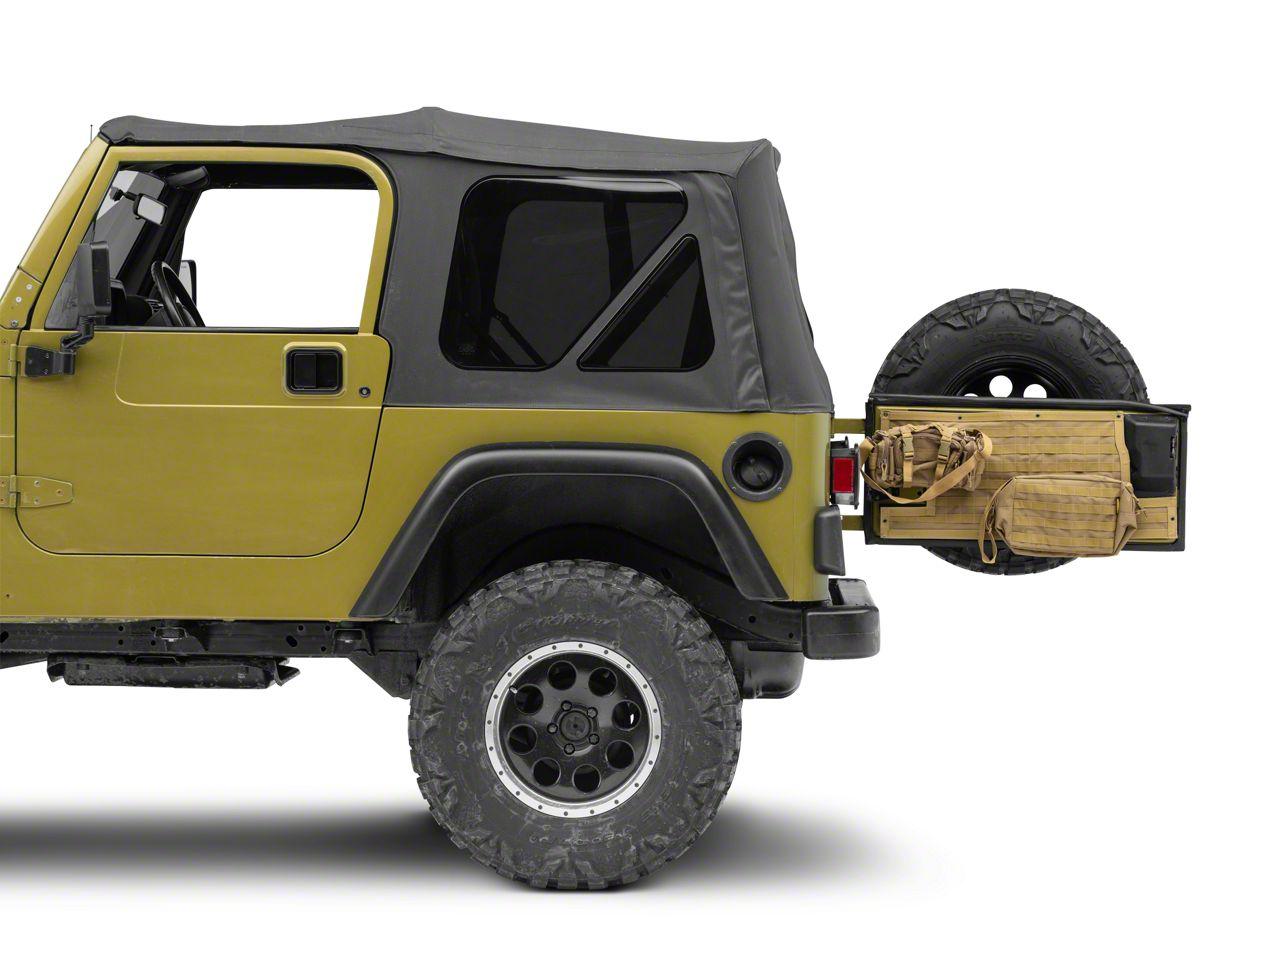 Smittybilt G.E.A.R. Tailgate Cover - Coyote Tan (97-06 Jeep Wrangler TJ)